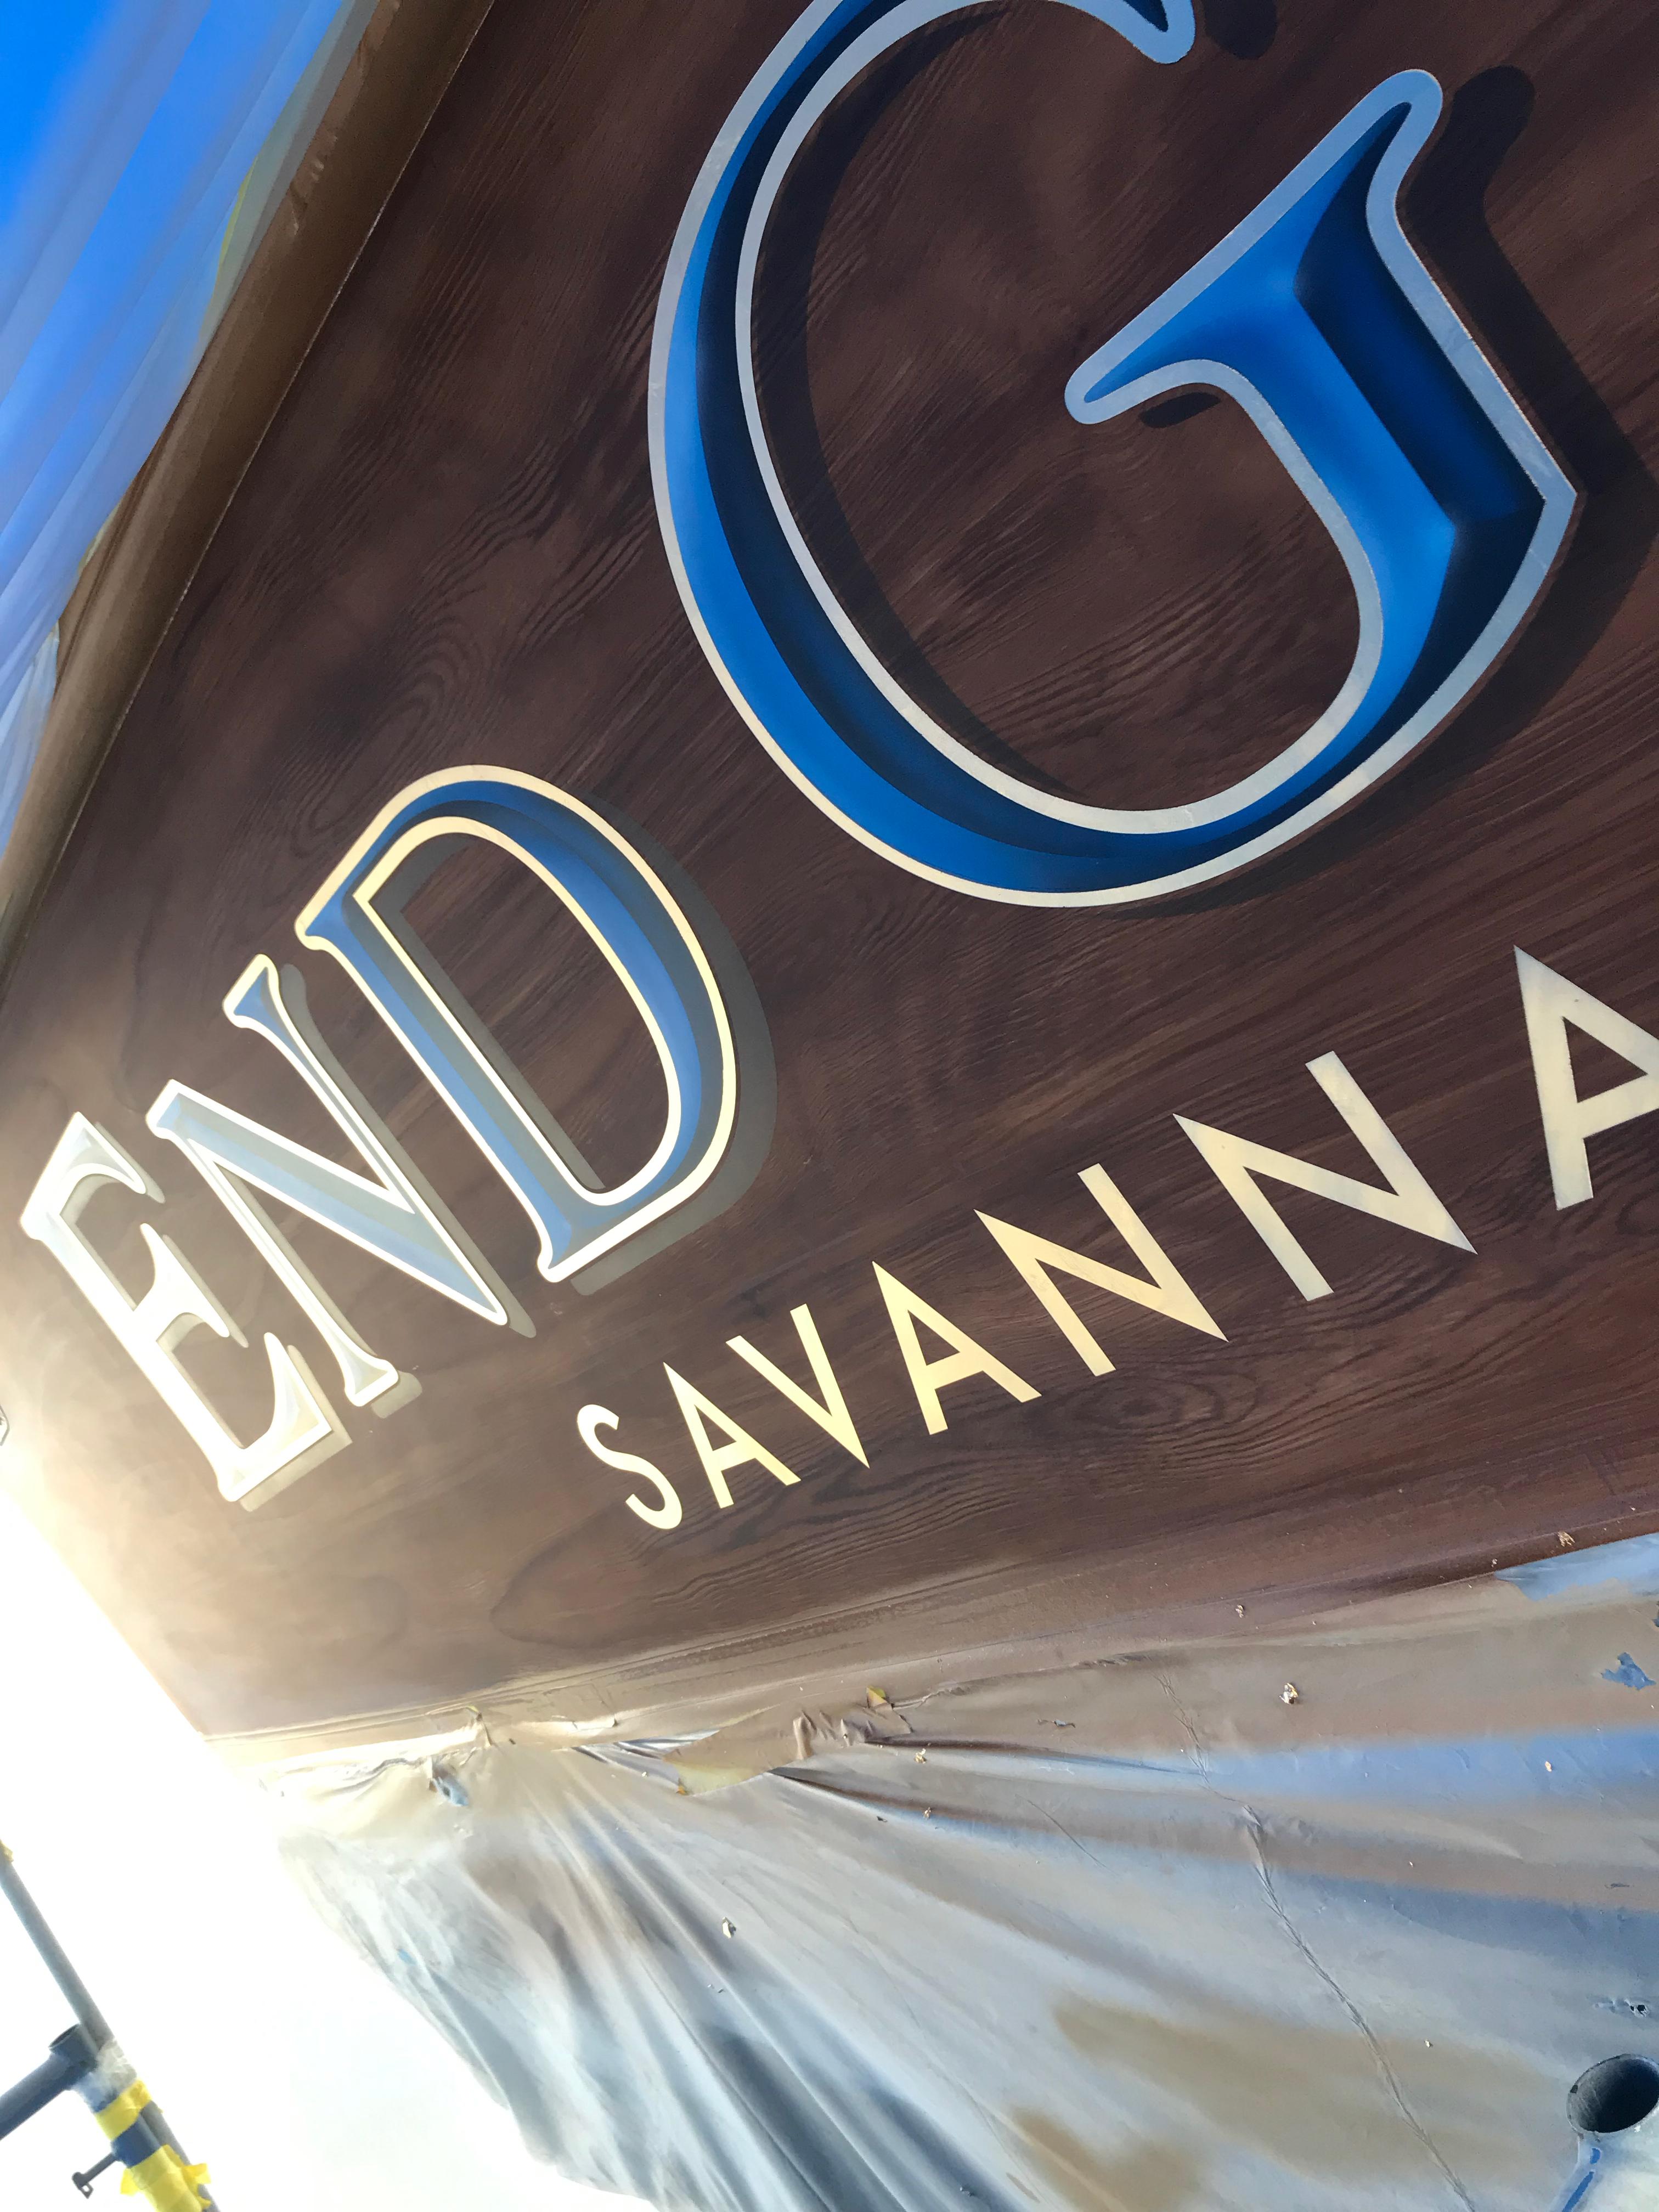 End Game Savannah Georgia Boat Transom